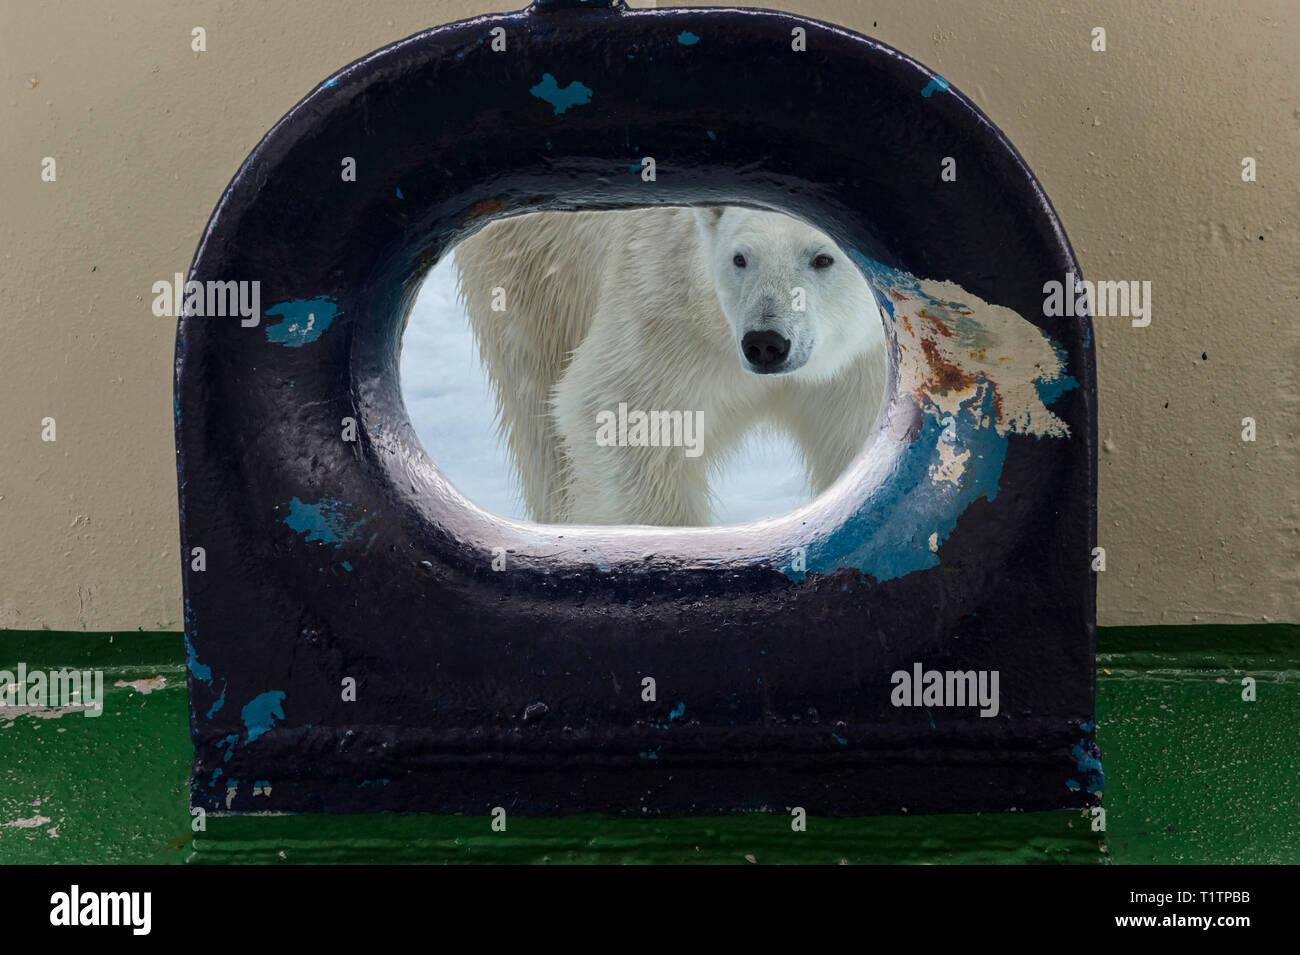 Polar Bear (Ursus maritimus) looking through opening in ship's deck, Svalbard Archipelago, Norway - Stock Image